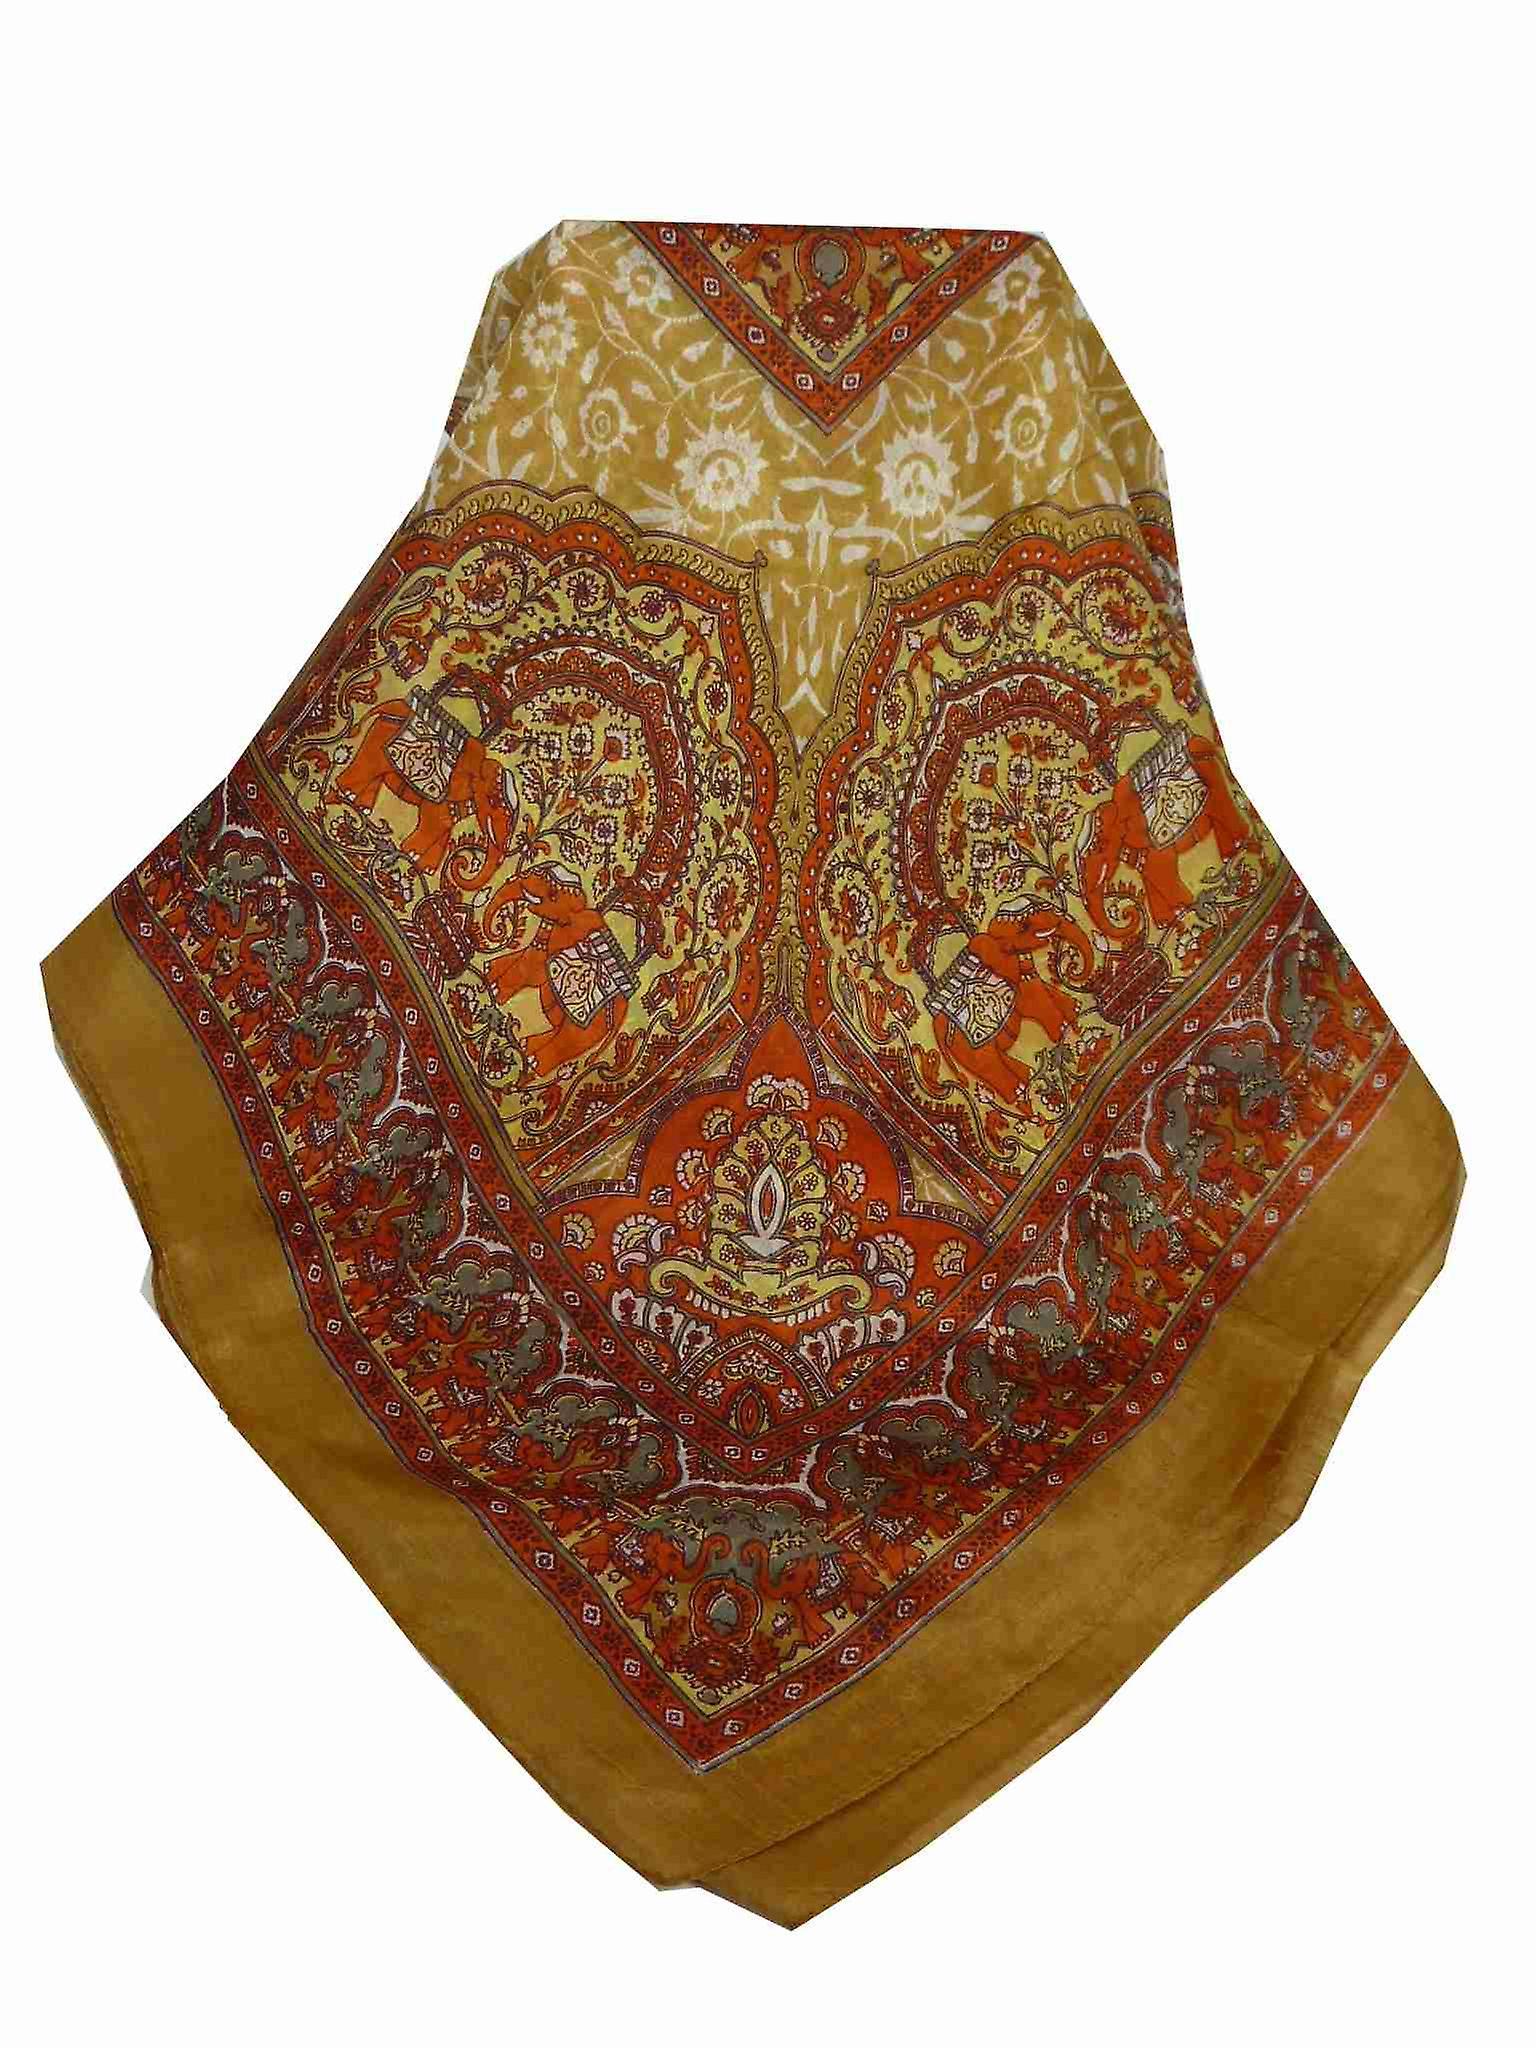 Mulberry Silk Traditional Square Scarf Ravali Caramel & Terracotta by Pashmina & Silk